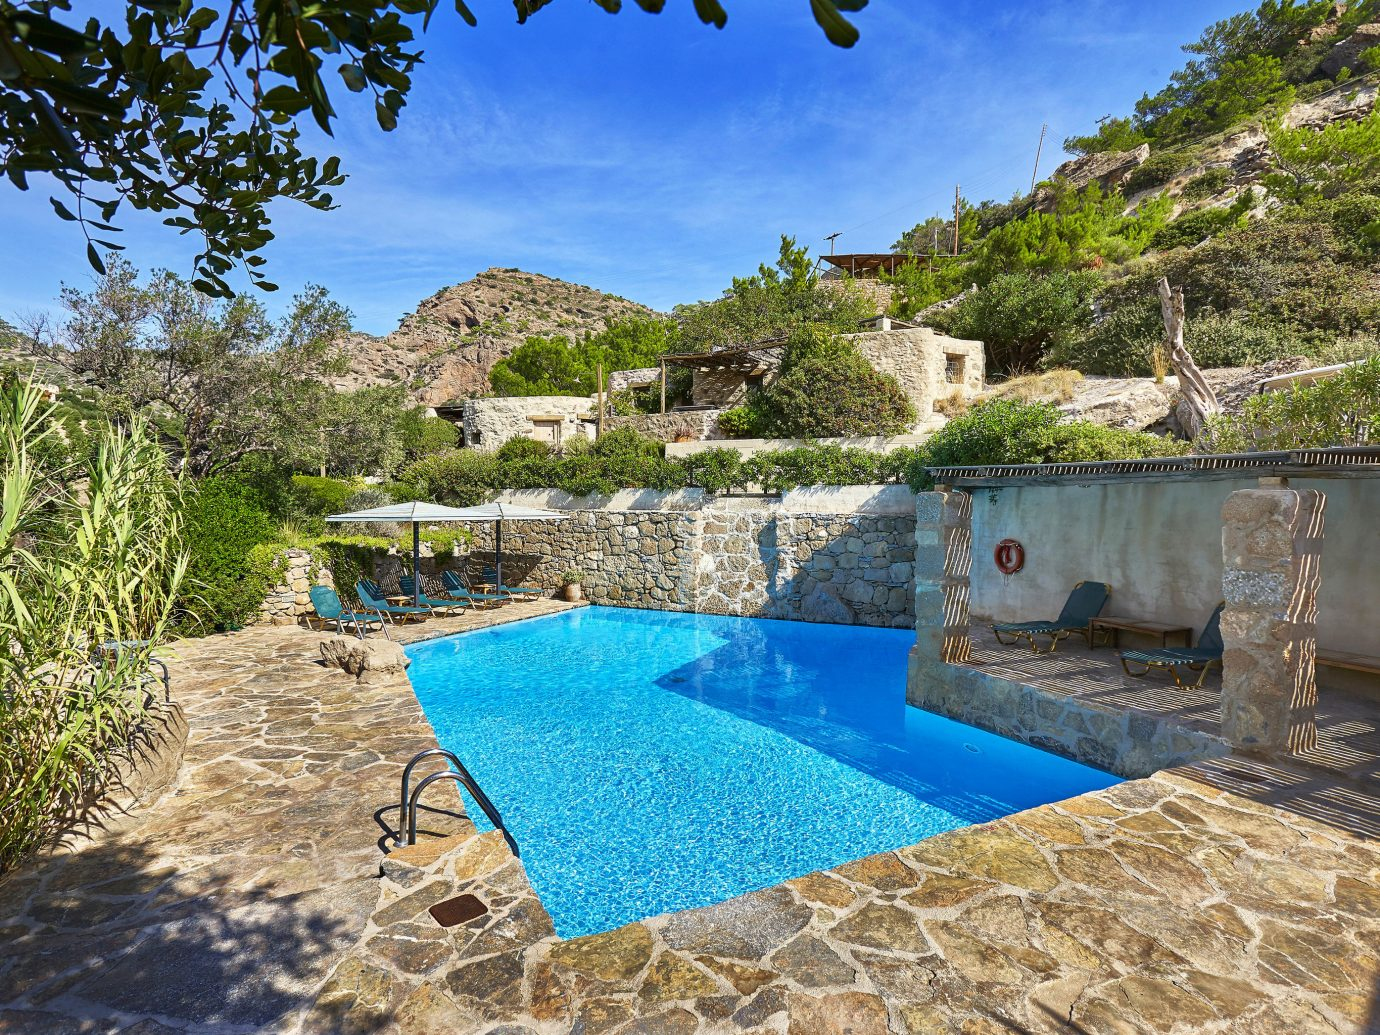 Trip Ideas outdoor swimming pool vacation estate Nature bay Villa Sea blue Resort stone